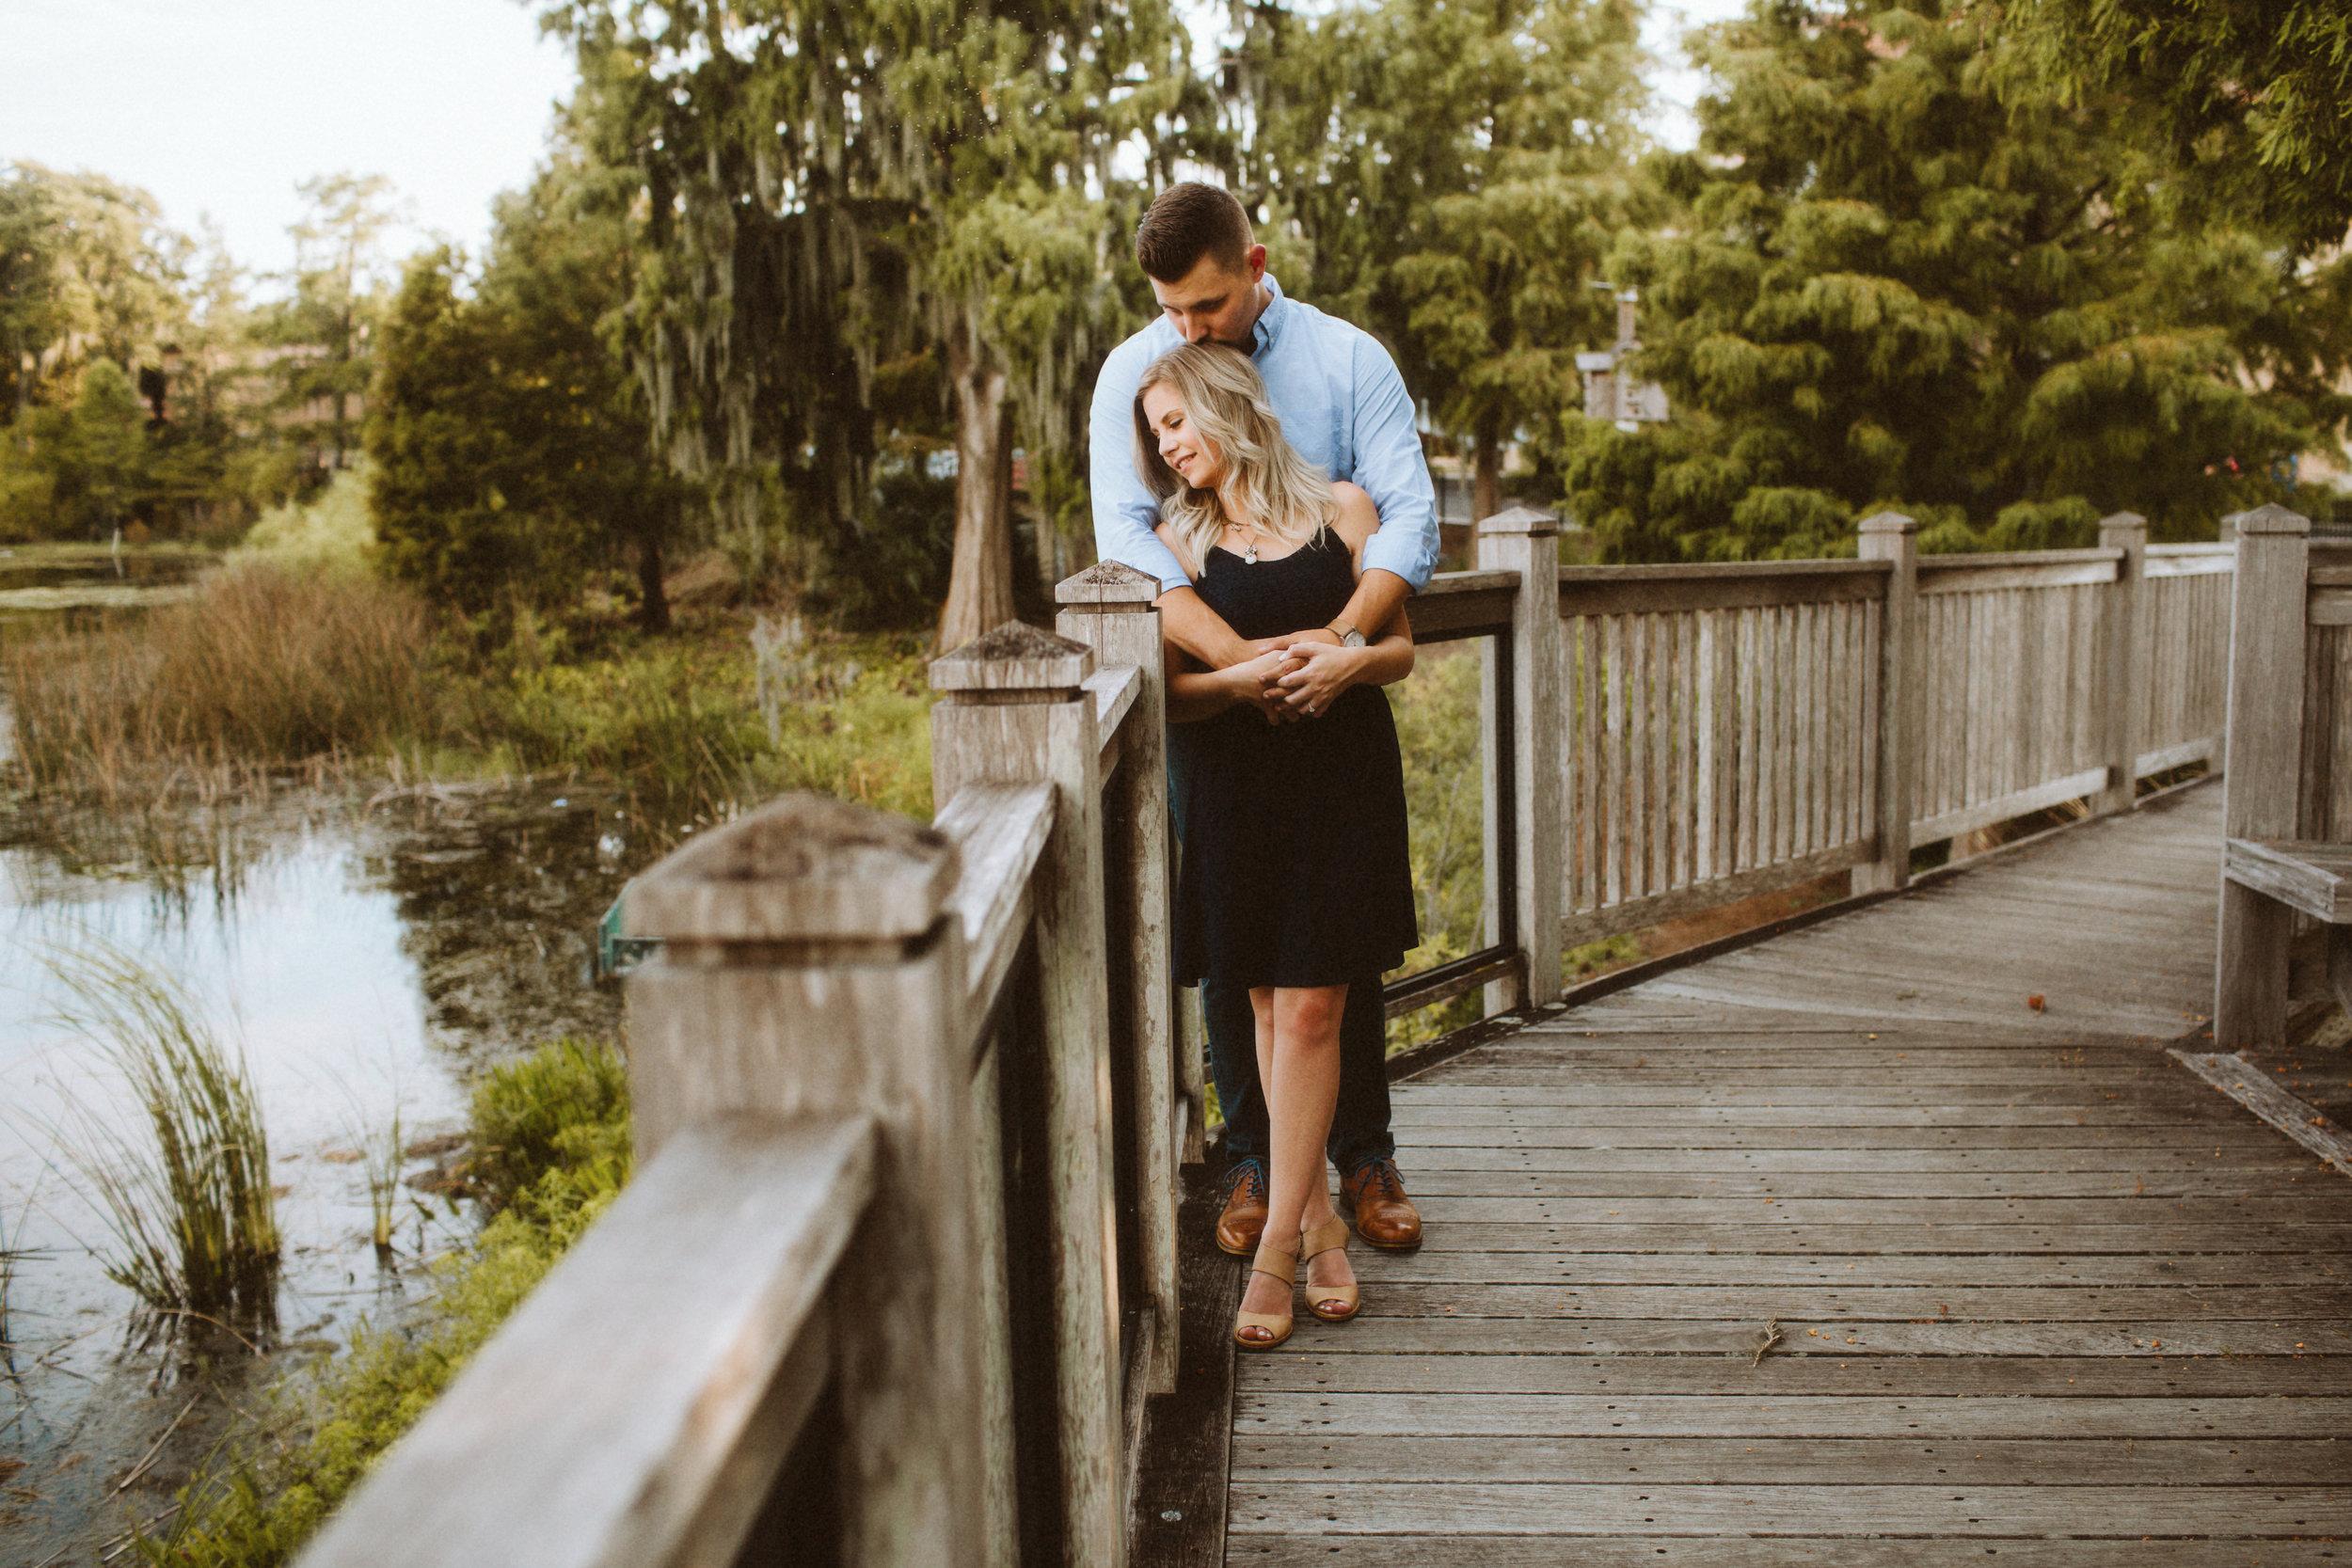 Engagement | Vanessa Boy Photography | vanessaboy.com |-50-2.com |final .jpg